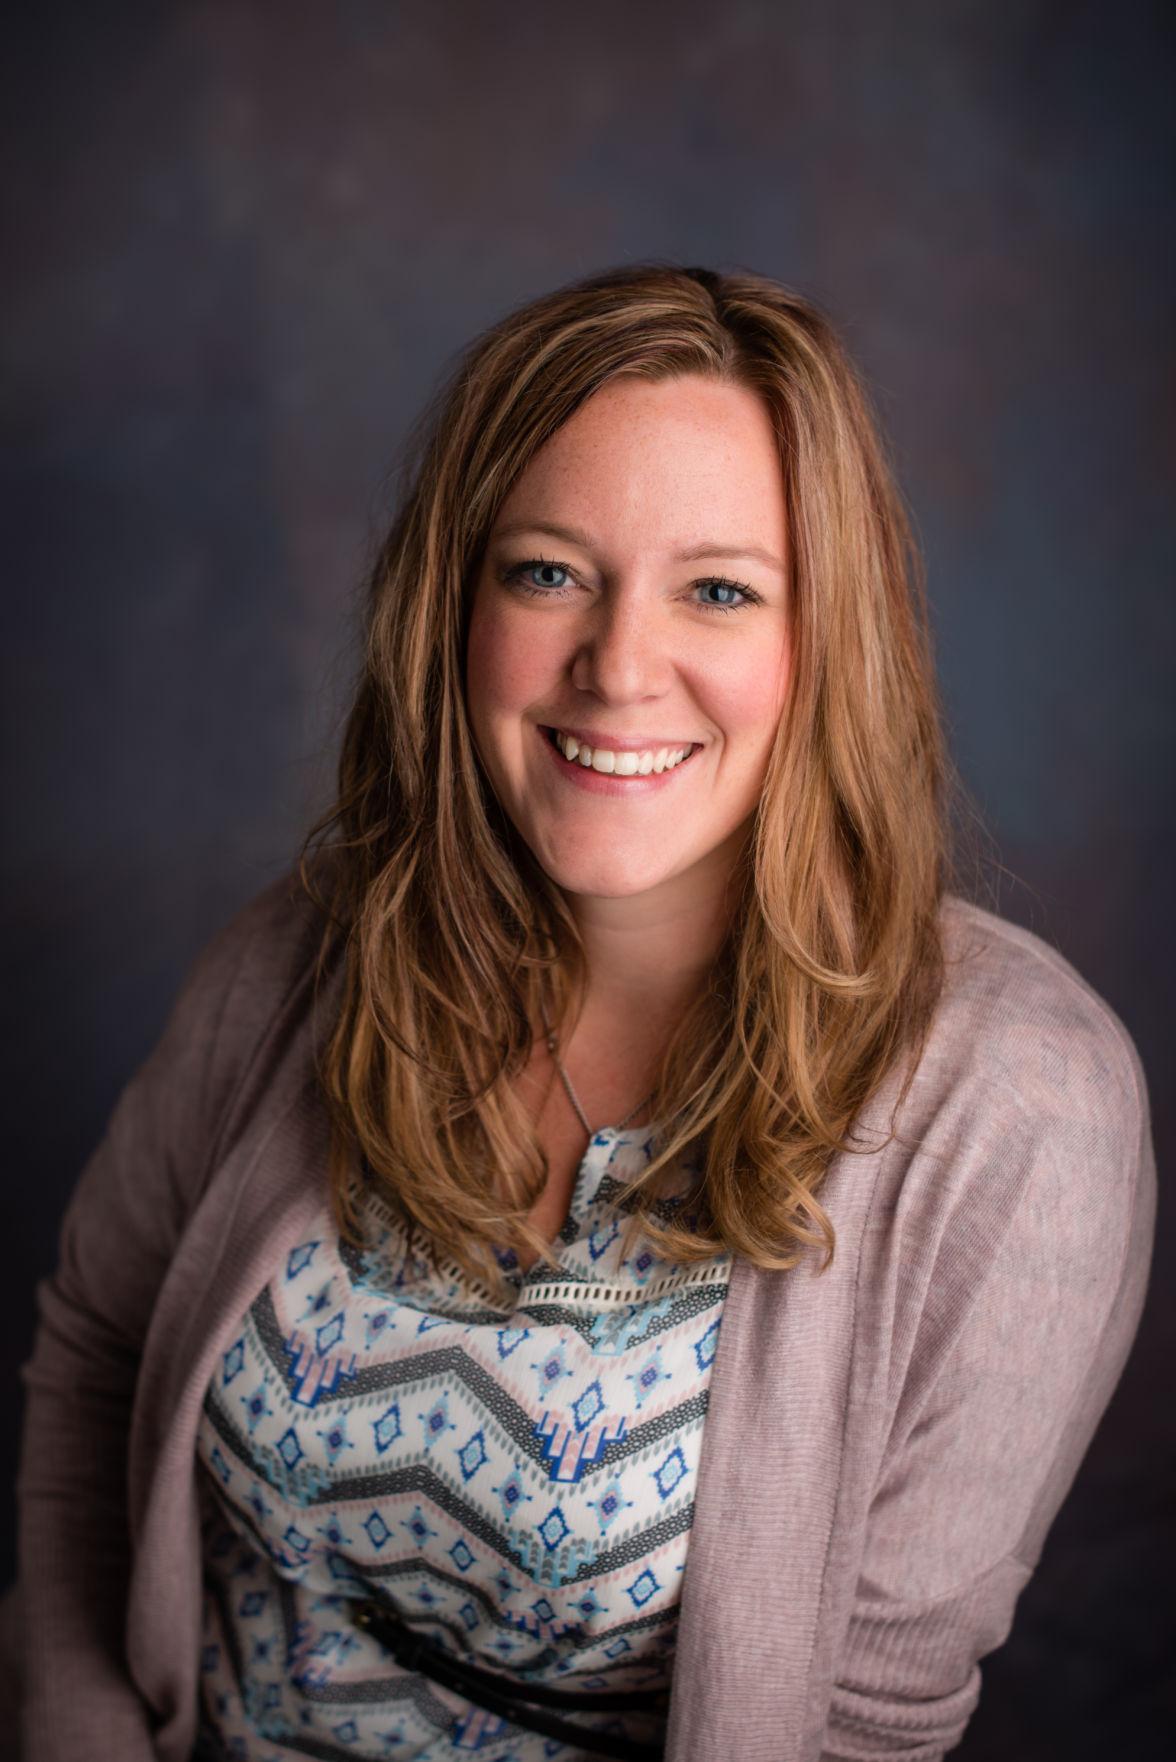 Jenni DeWitt (mugshot)